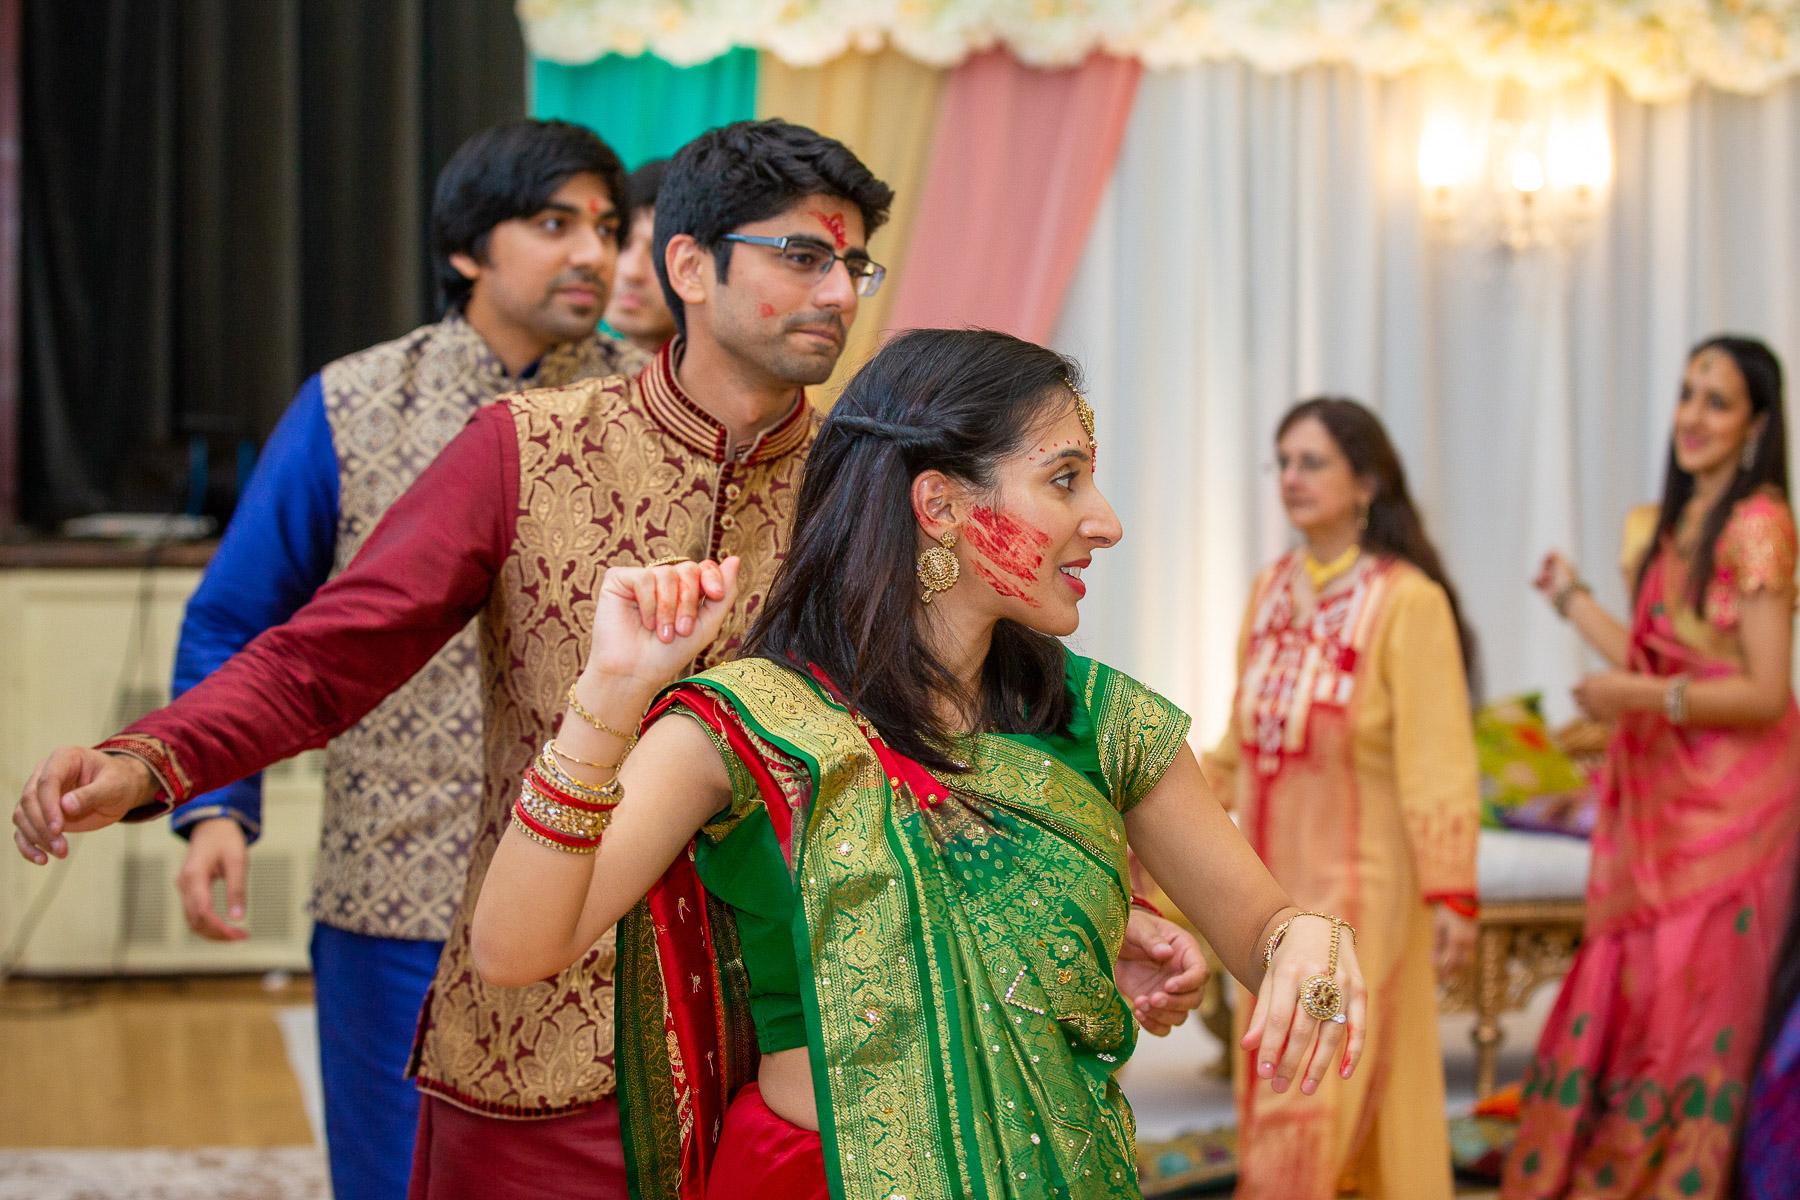 Asian-wedding-photographer-Bristol-hindu-baby-shower-godh-bharai-natalia-smith-photography-0073.jpg